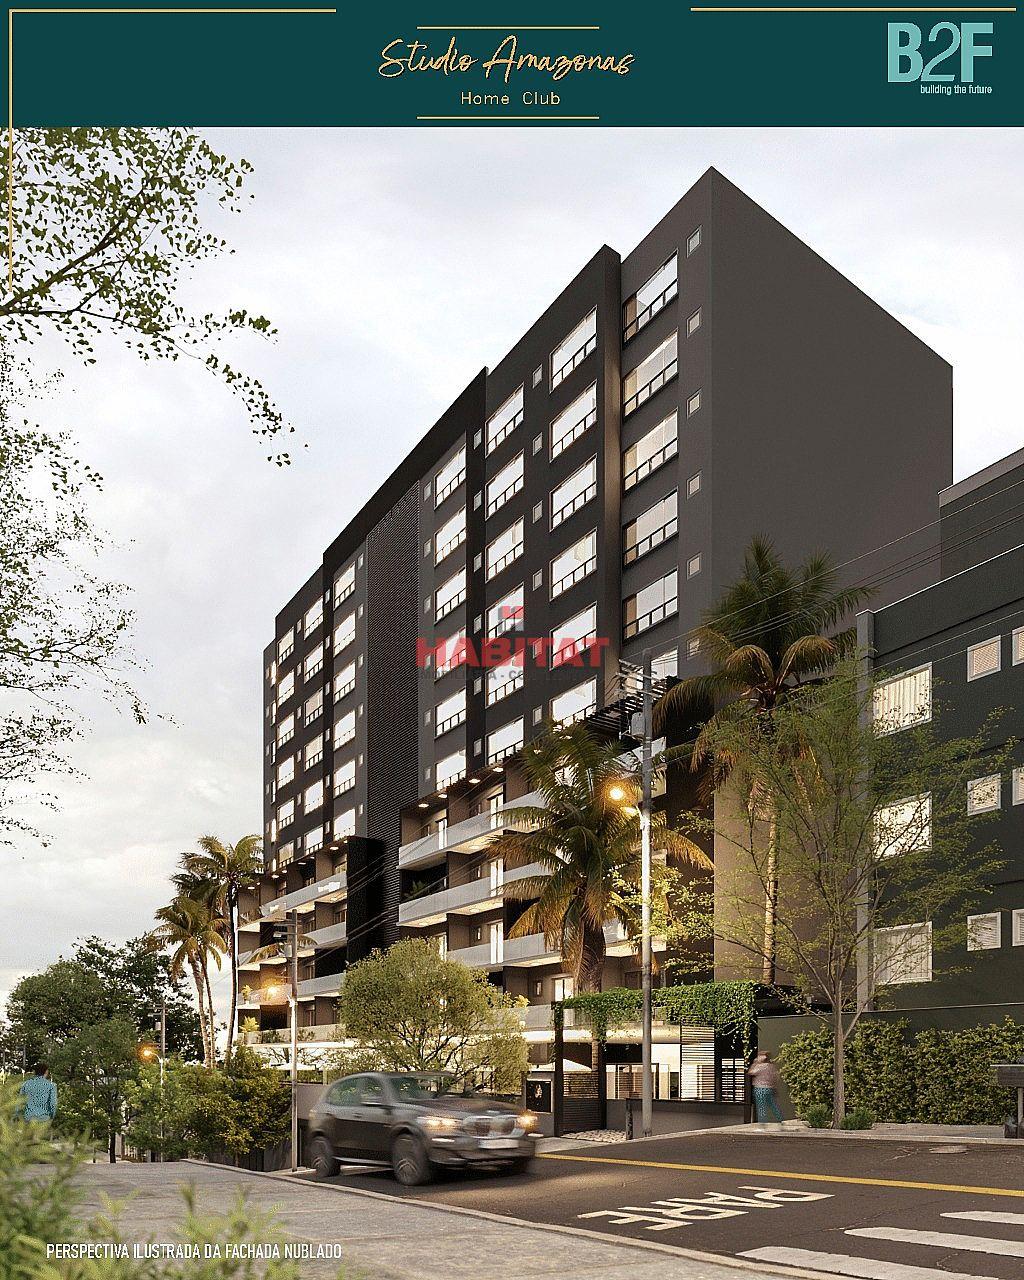 Apartamento para Venda - Residencial Amazonas - Franca/SP - STUDIO AMAZONAS